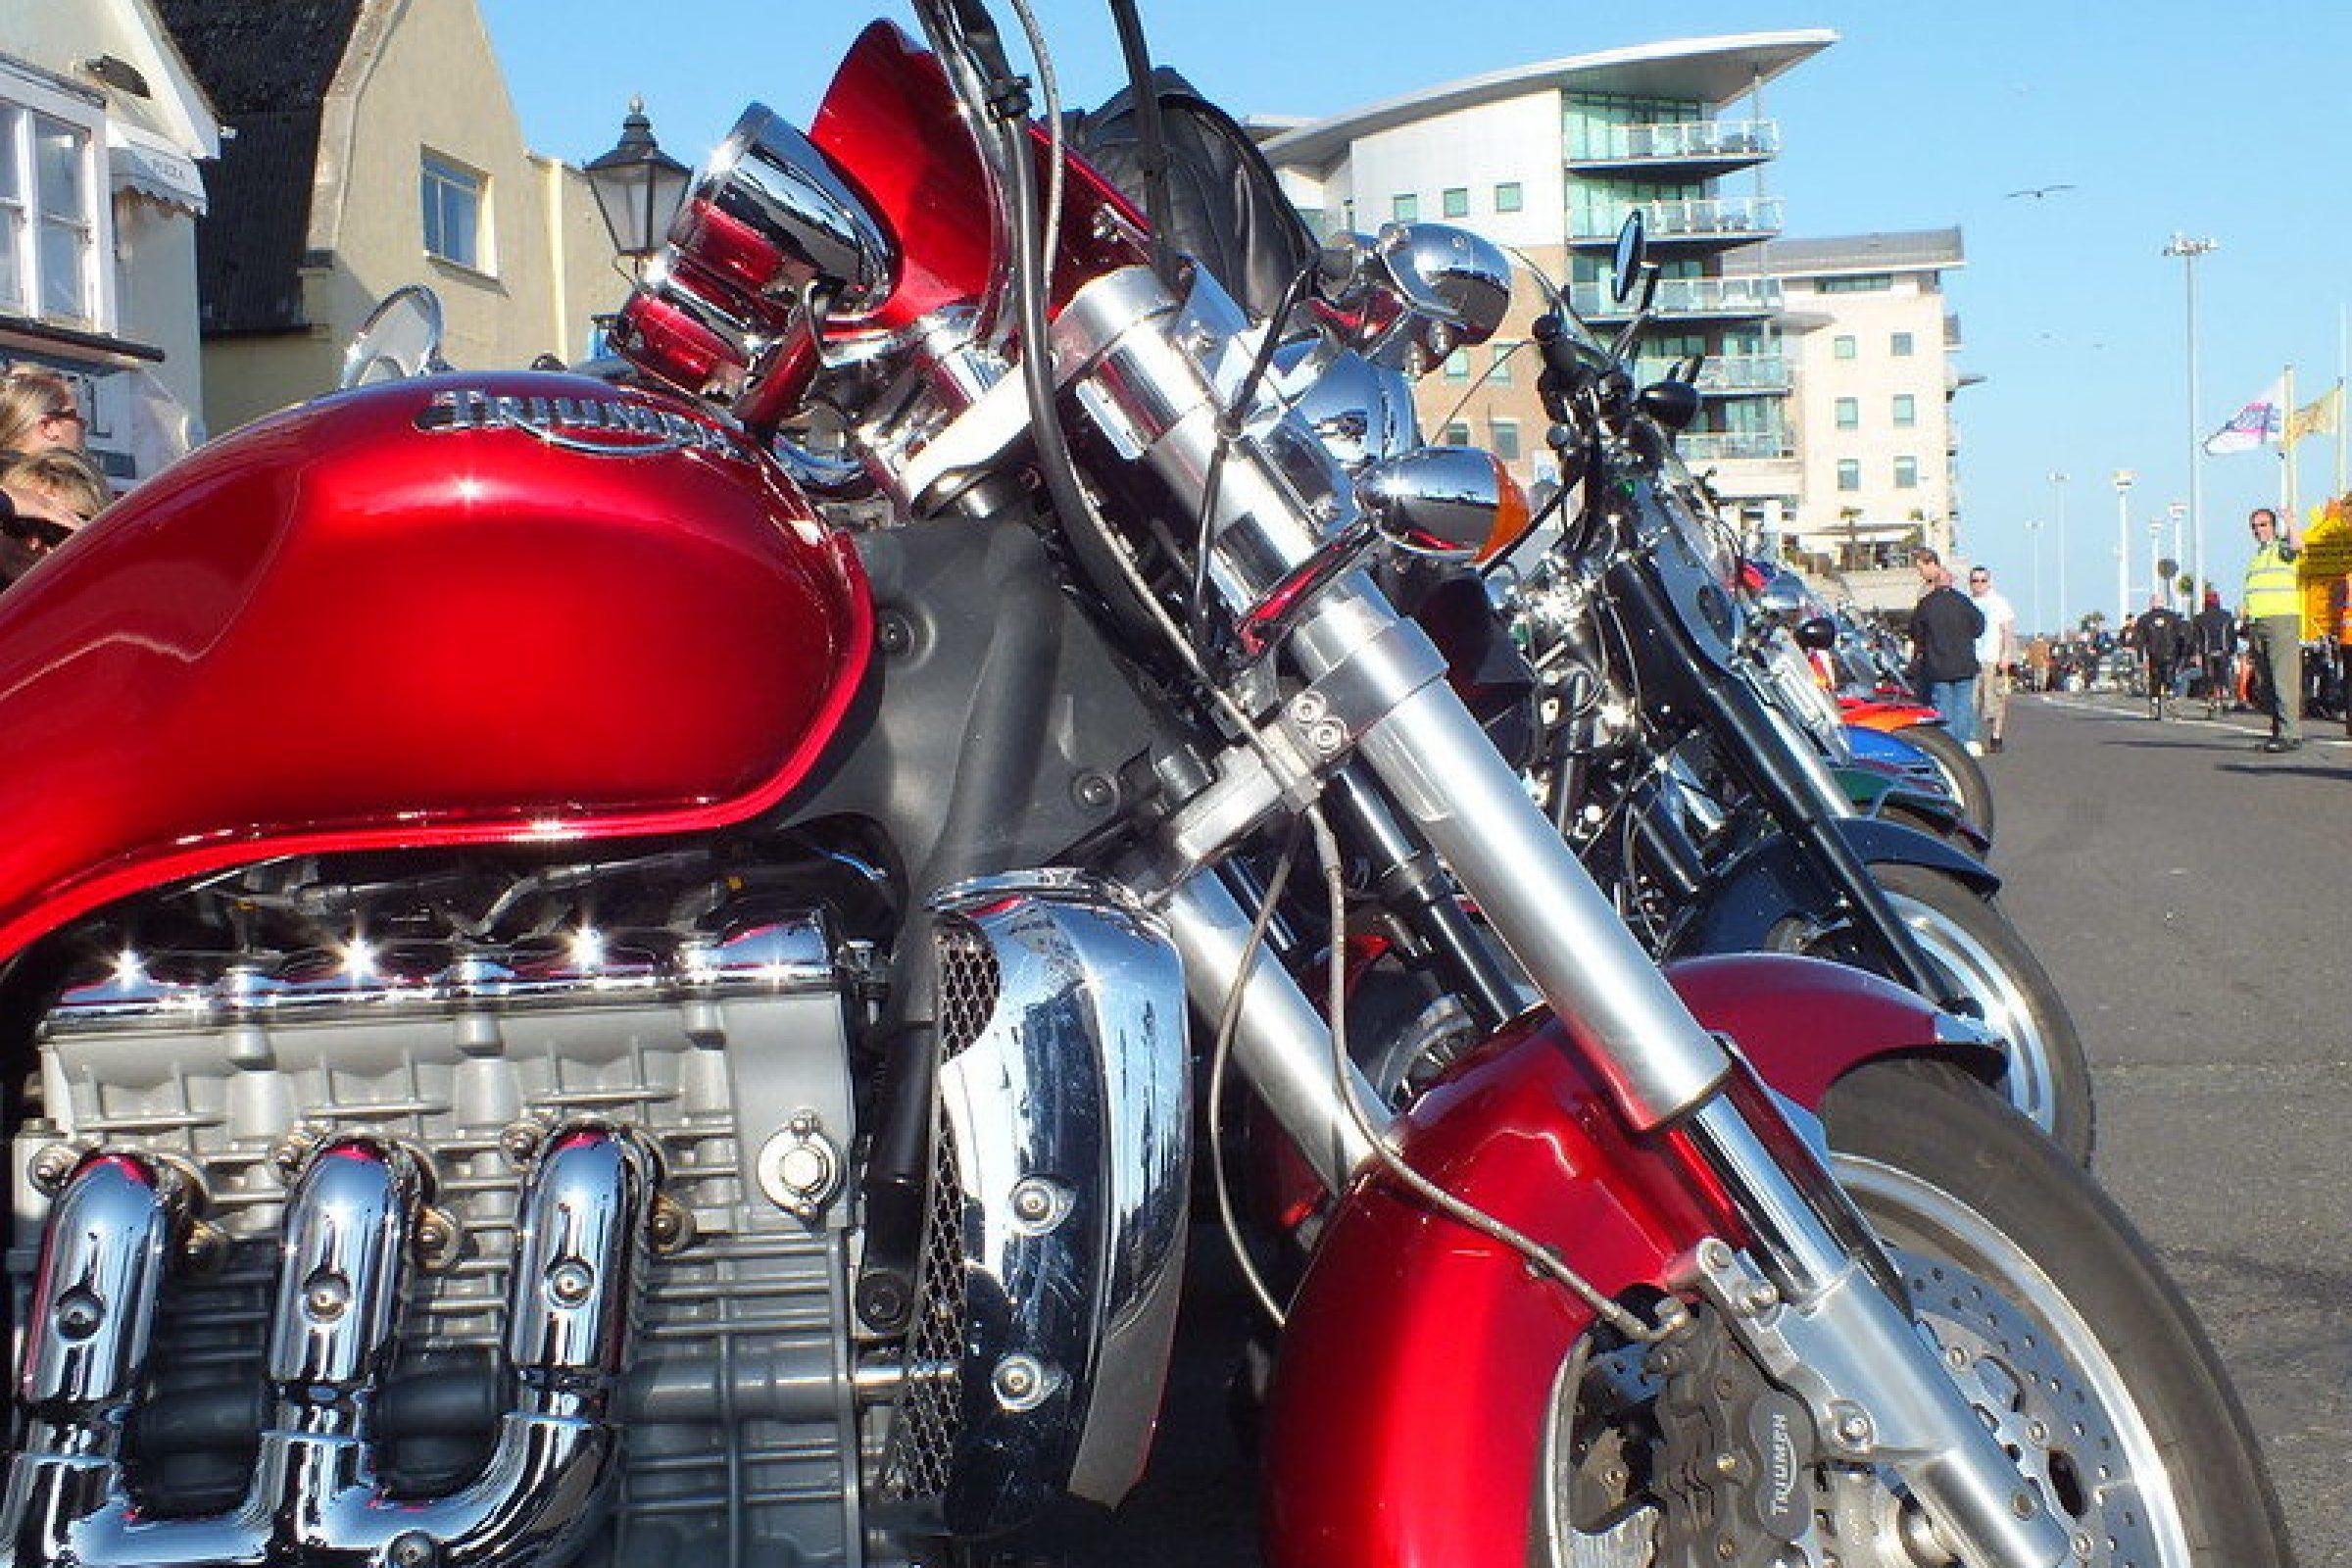 motorbike at poole quay